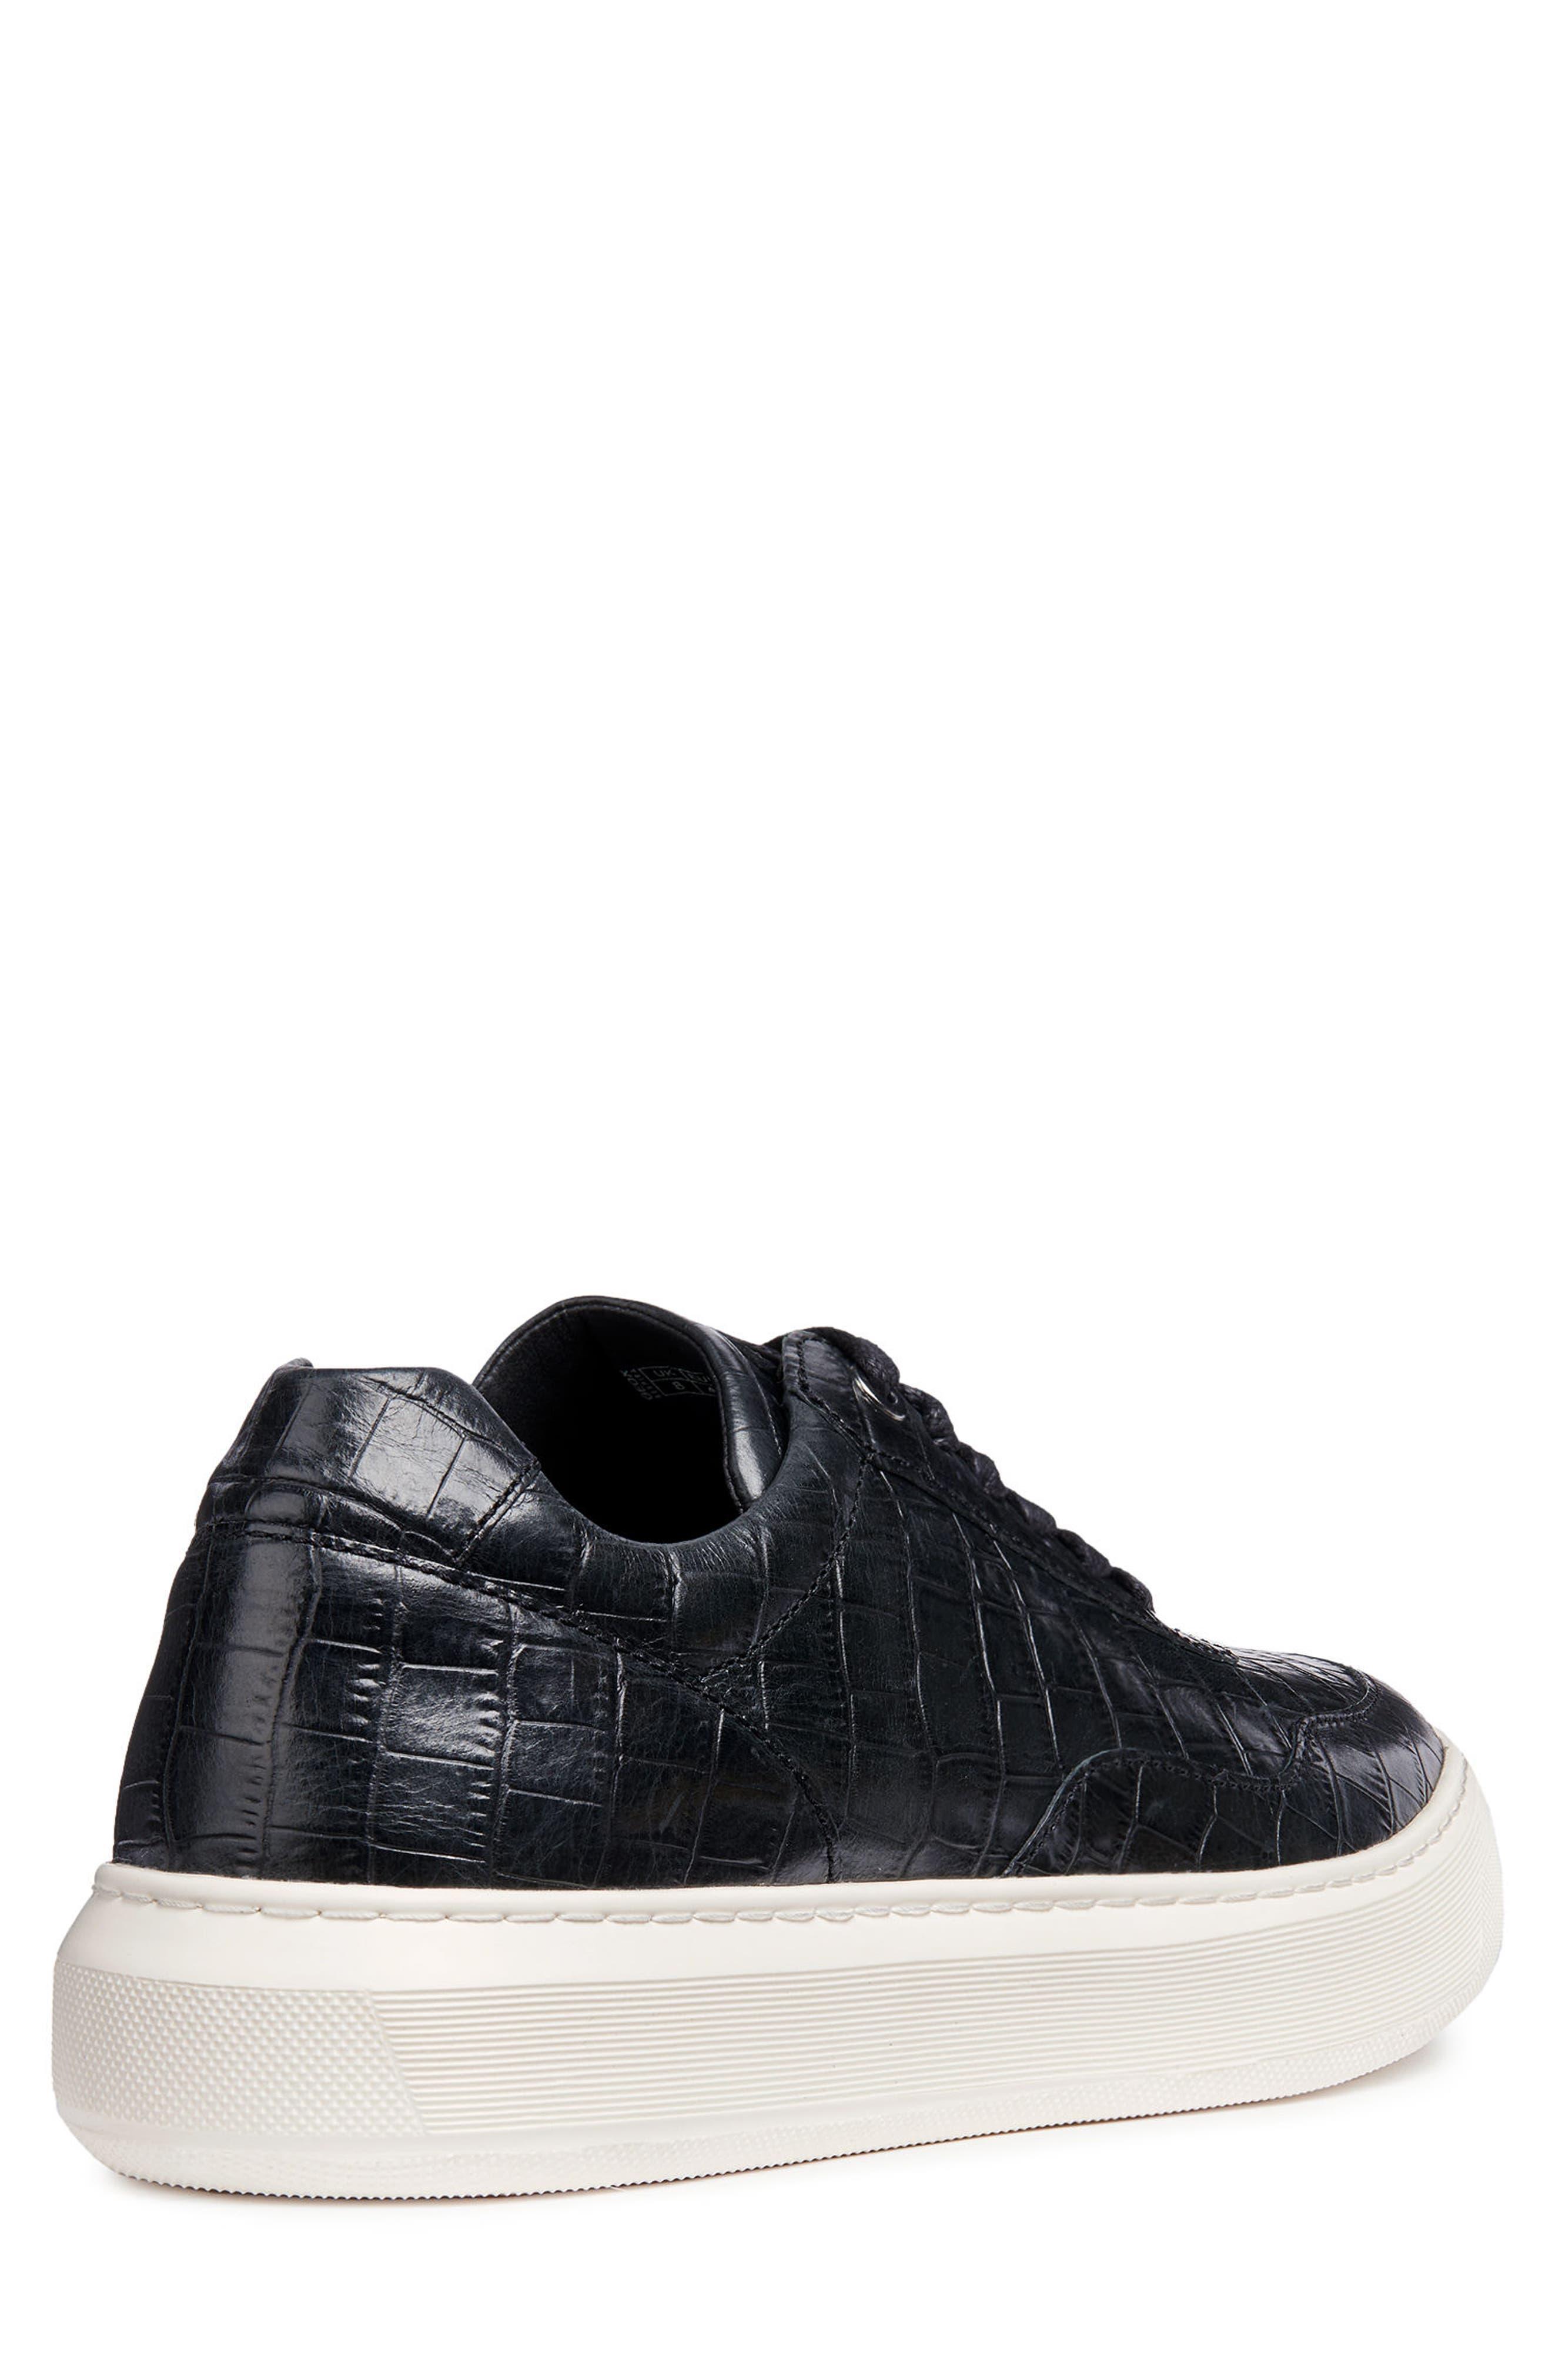 Deiven 8 Croc Textured Low Top Sneaker,                             Alternate thumbnail 2, color,                             BLACK LEATHER